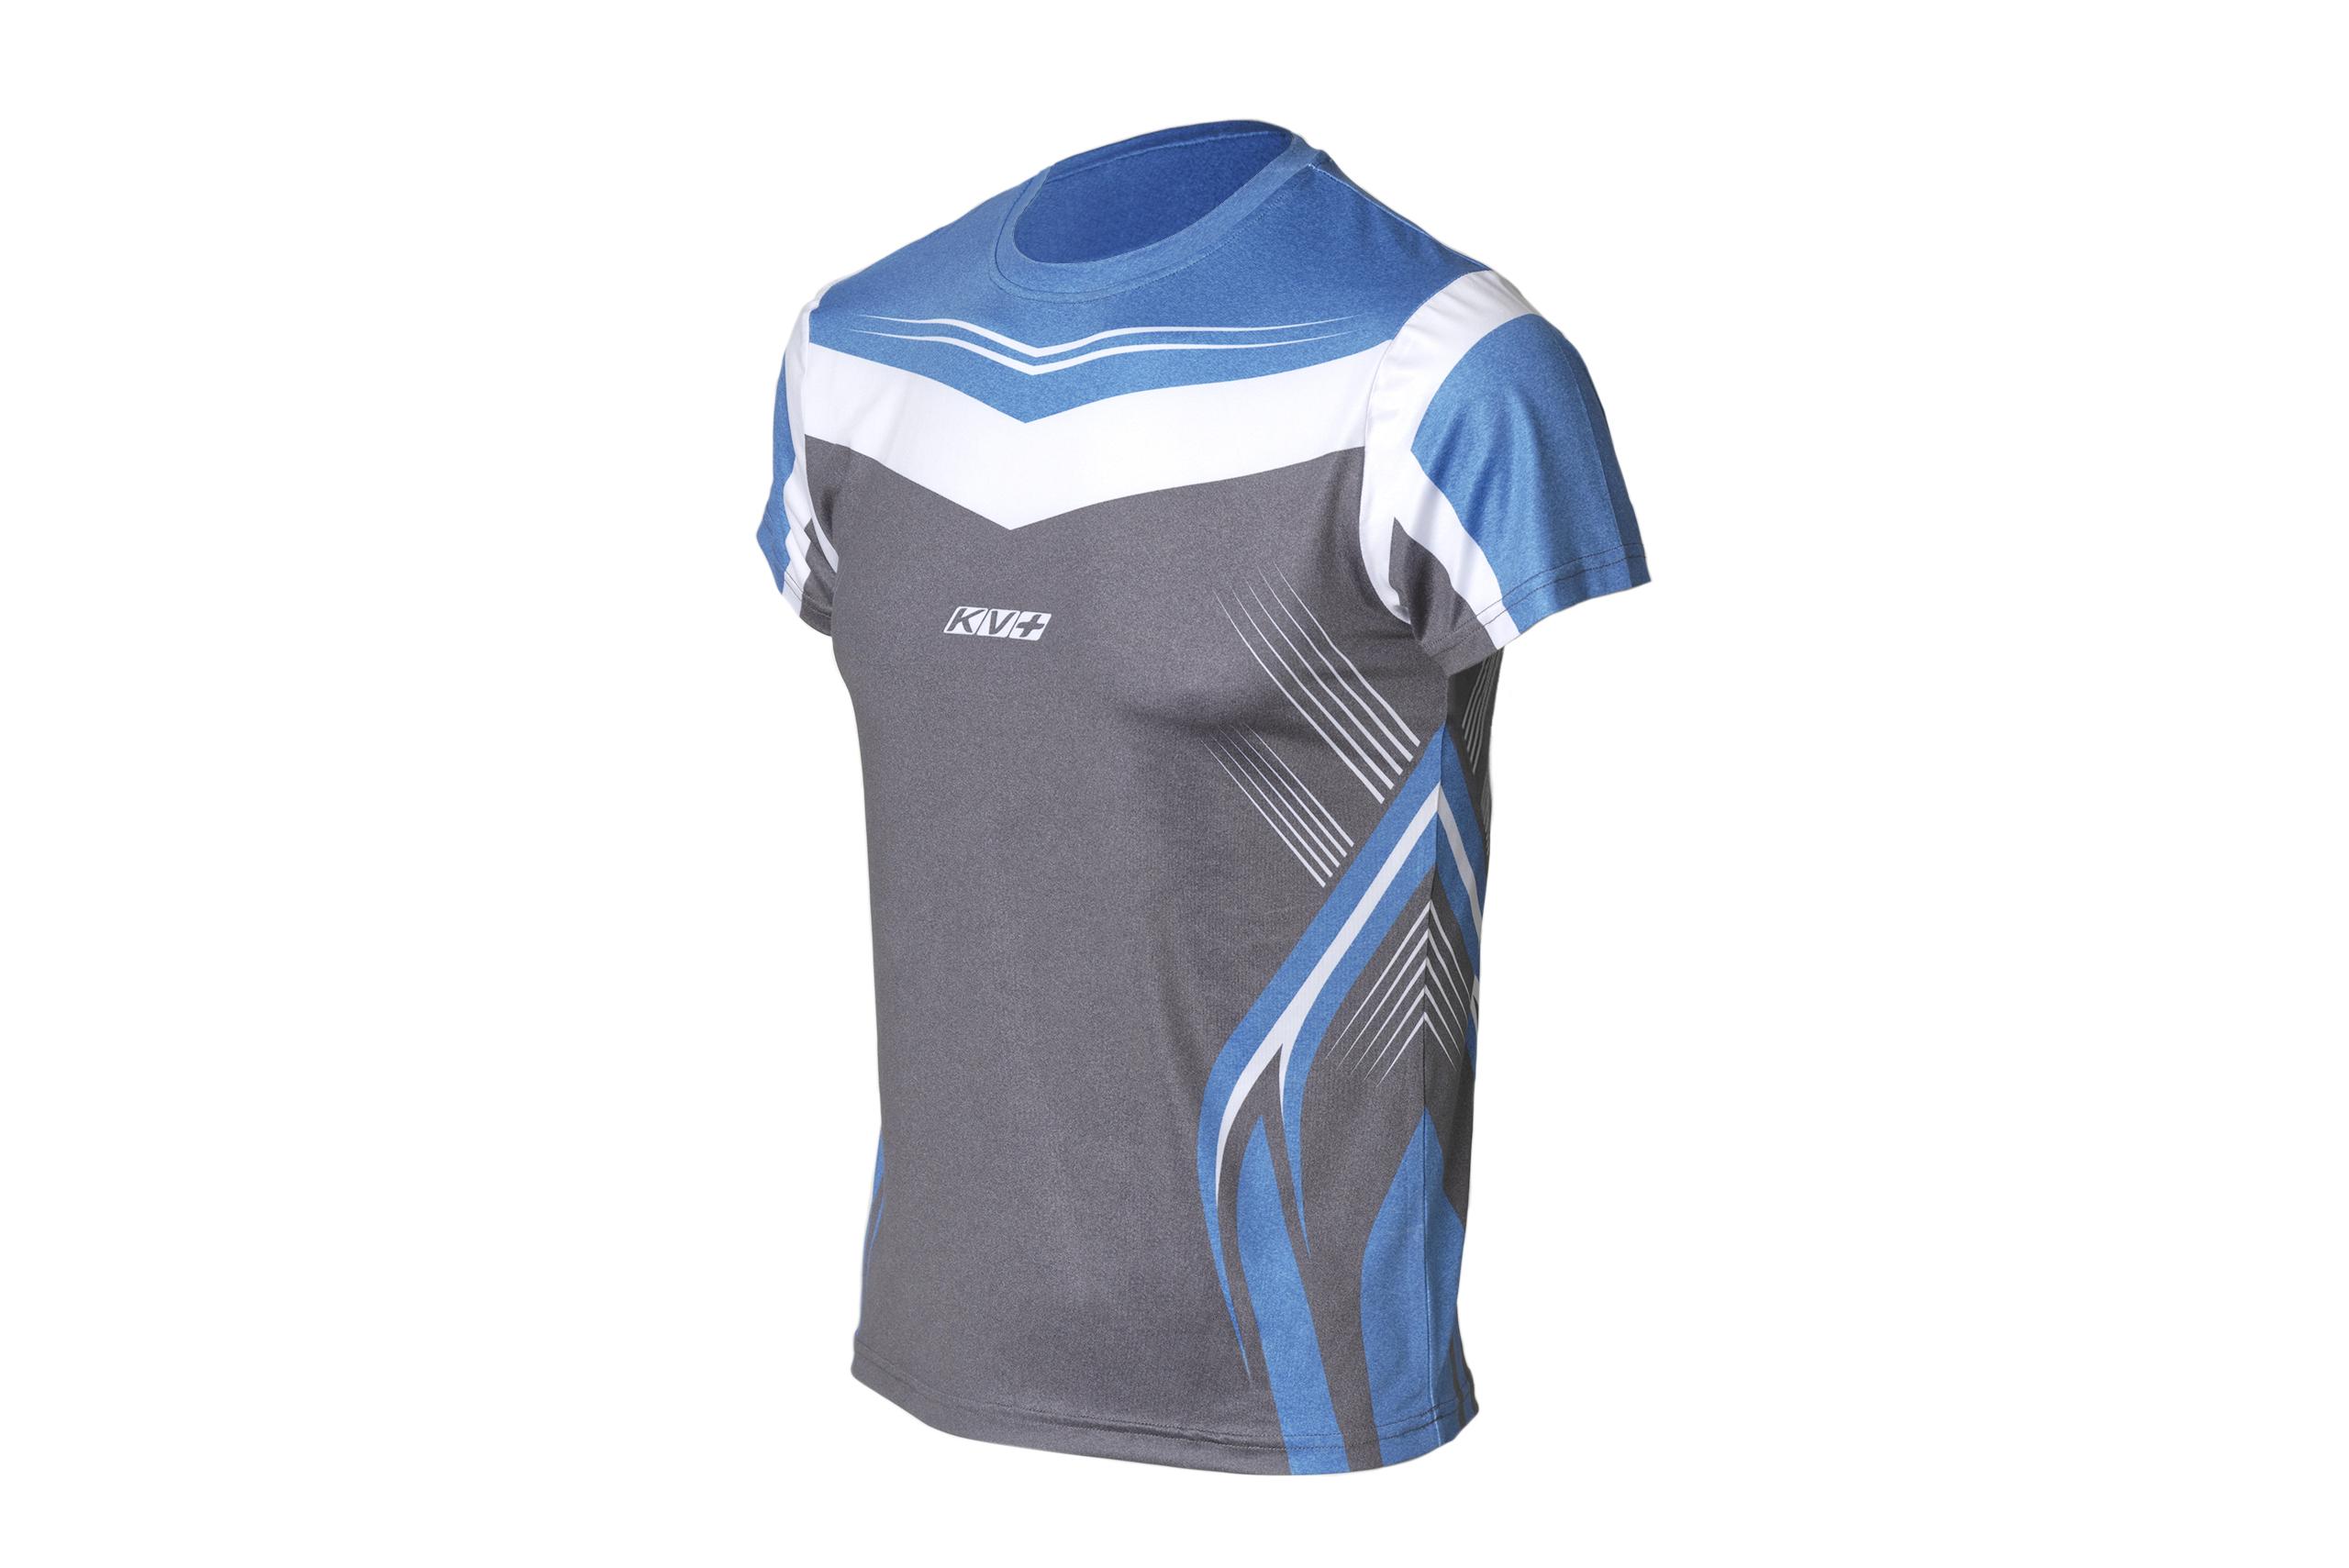 SPRINT T-SHIRT UNISEX (blue/grey)